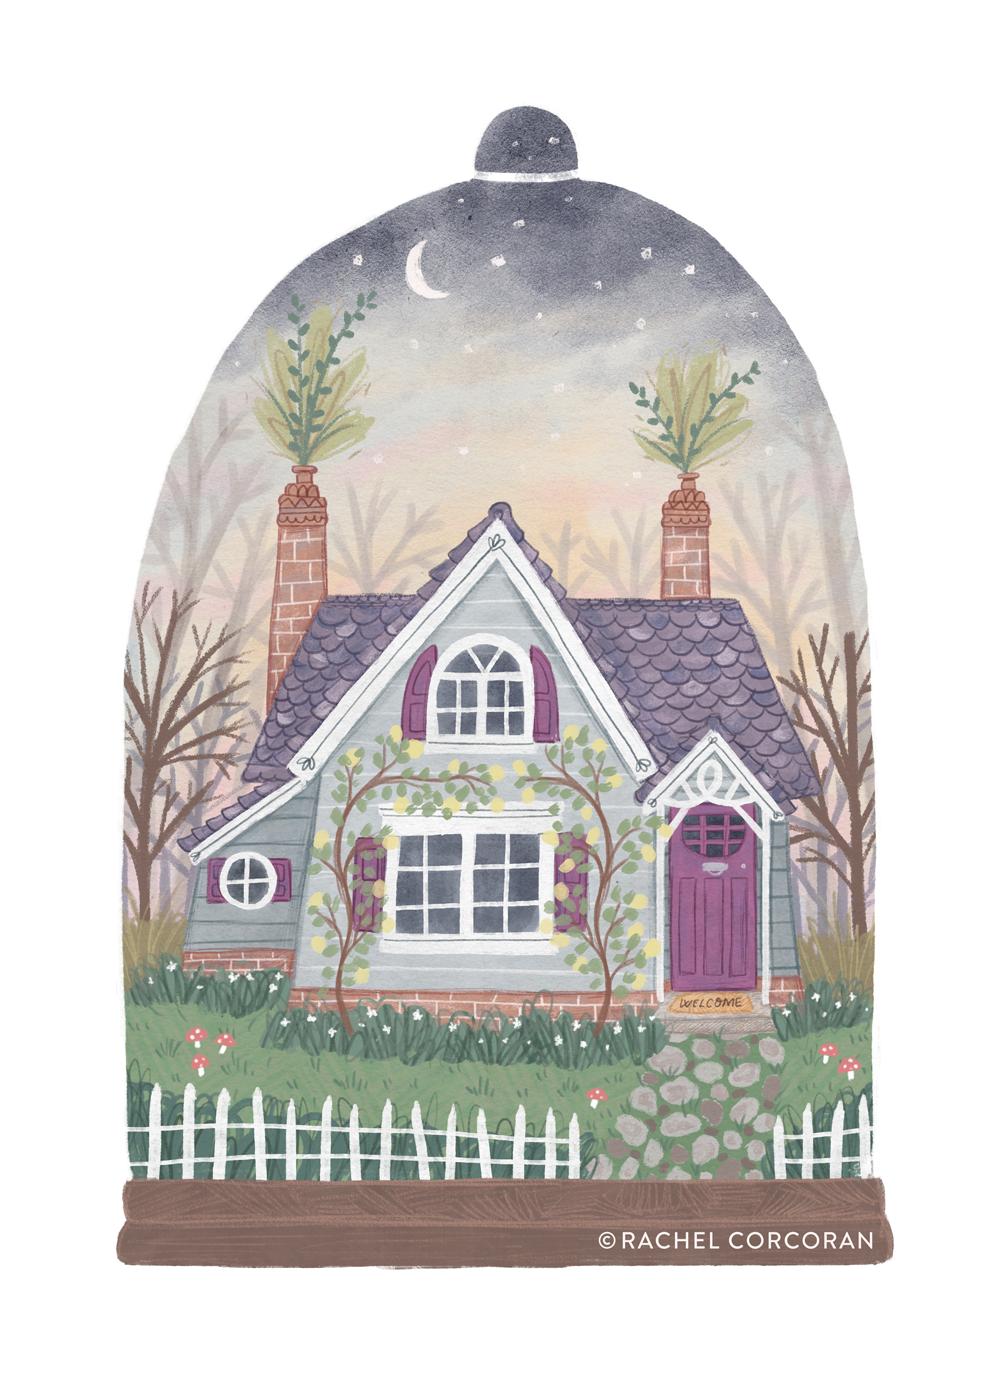 Tiny house terrarium illustration by Rachel Corcoran